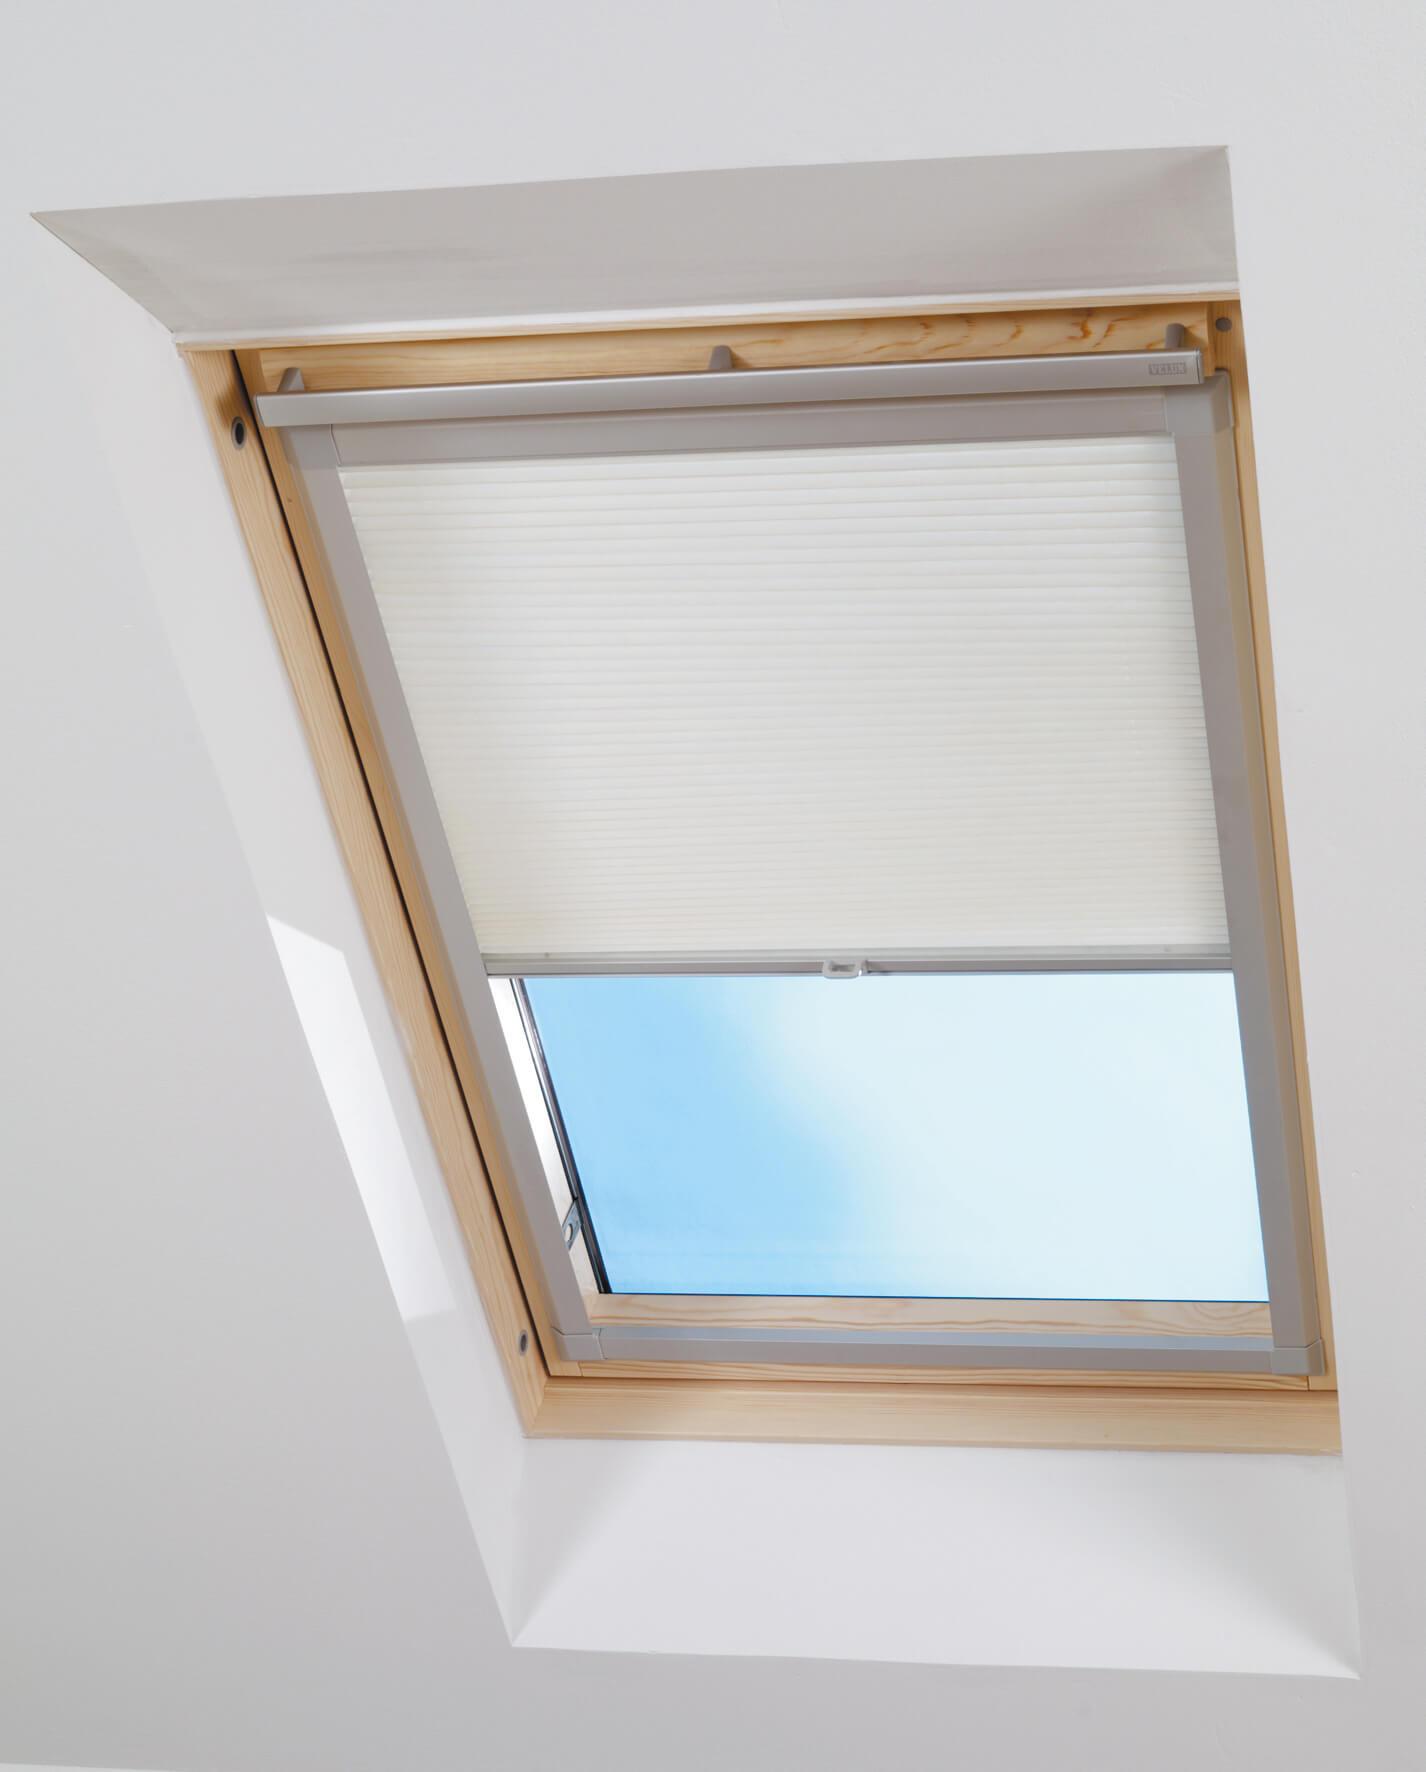 light blinds com filtering view americanblinds cellular skylight p bella legacy motorized